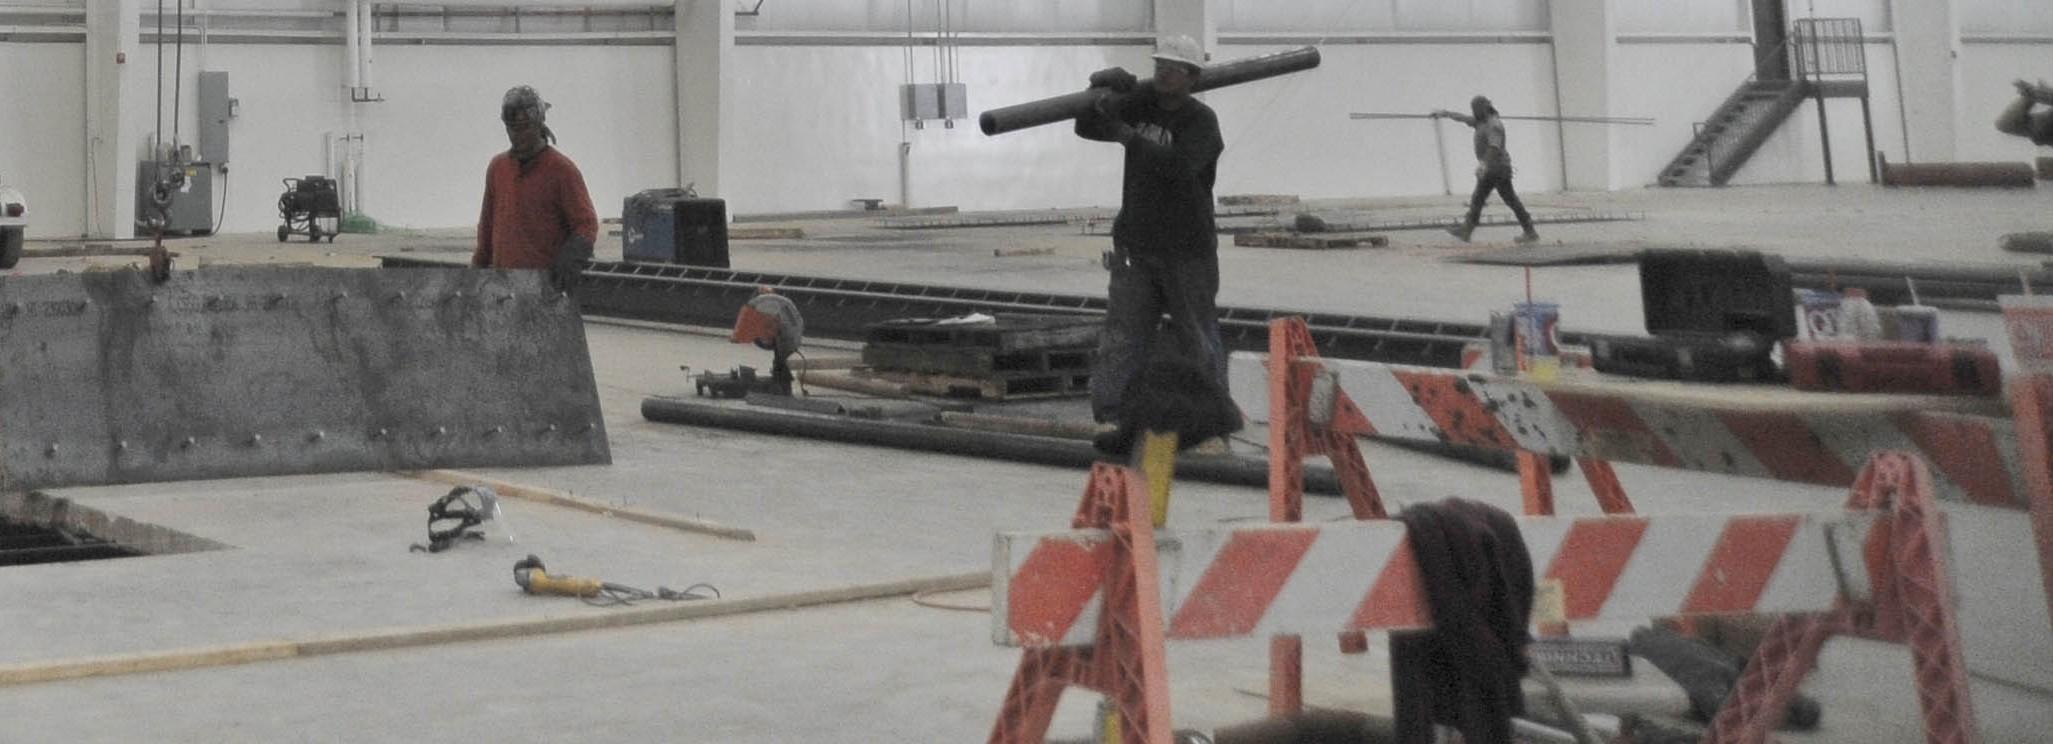 Progressive Industries Industrial Construction Interior Work